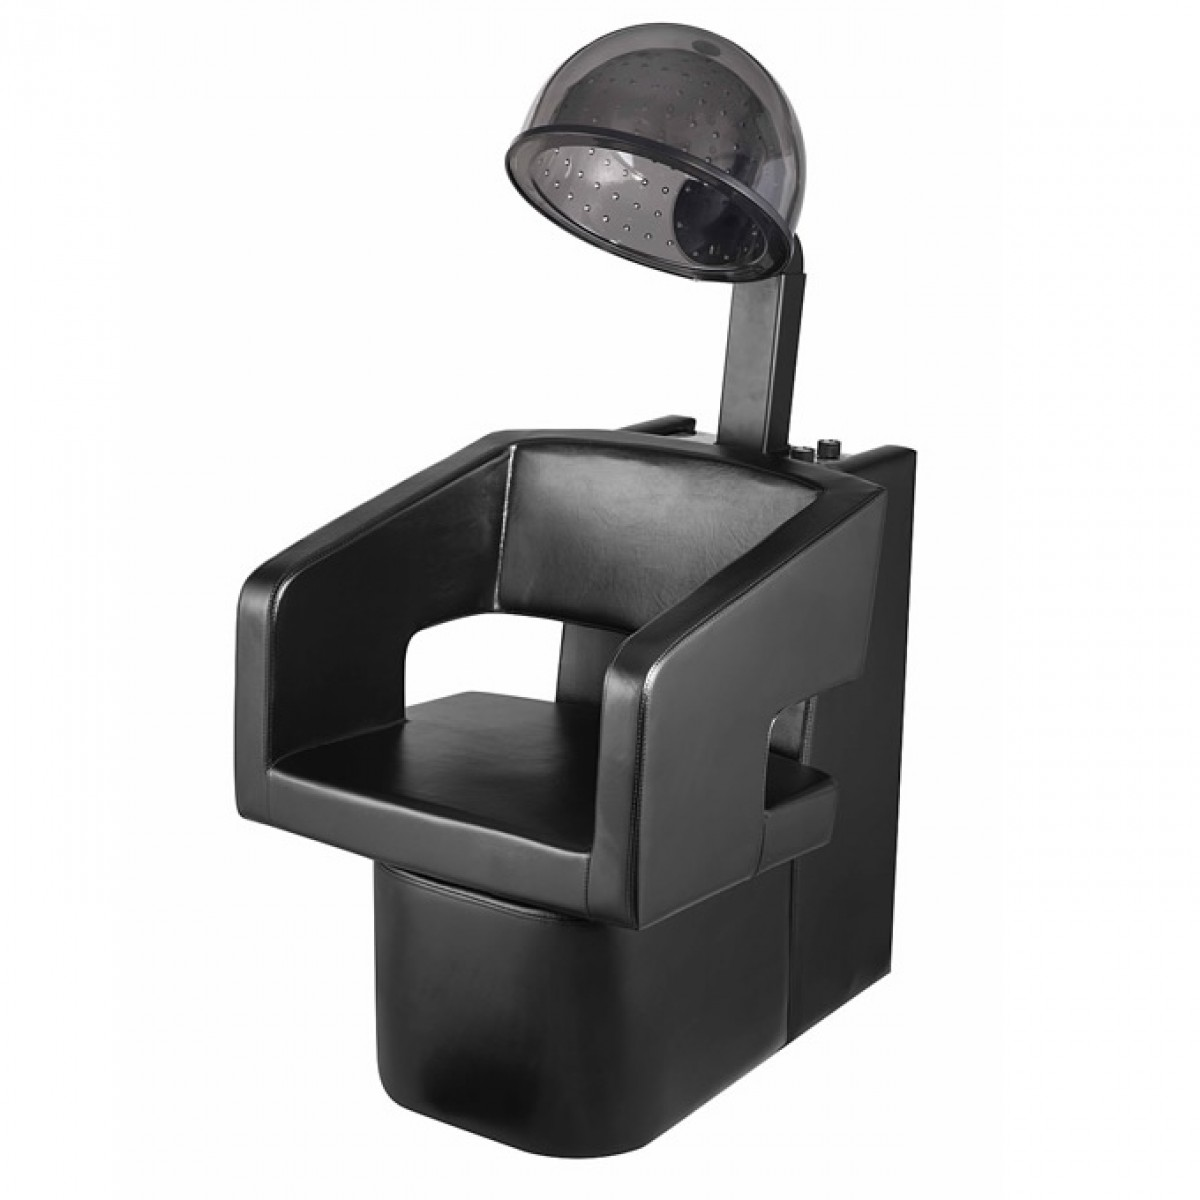 Picasso salon dryer chair - Salon chair with hair dryer ...